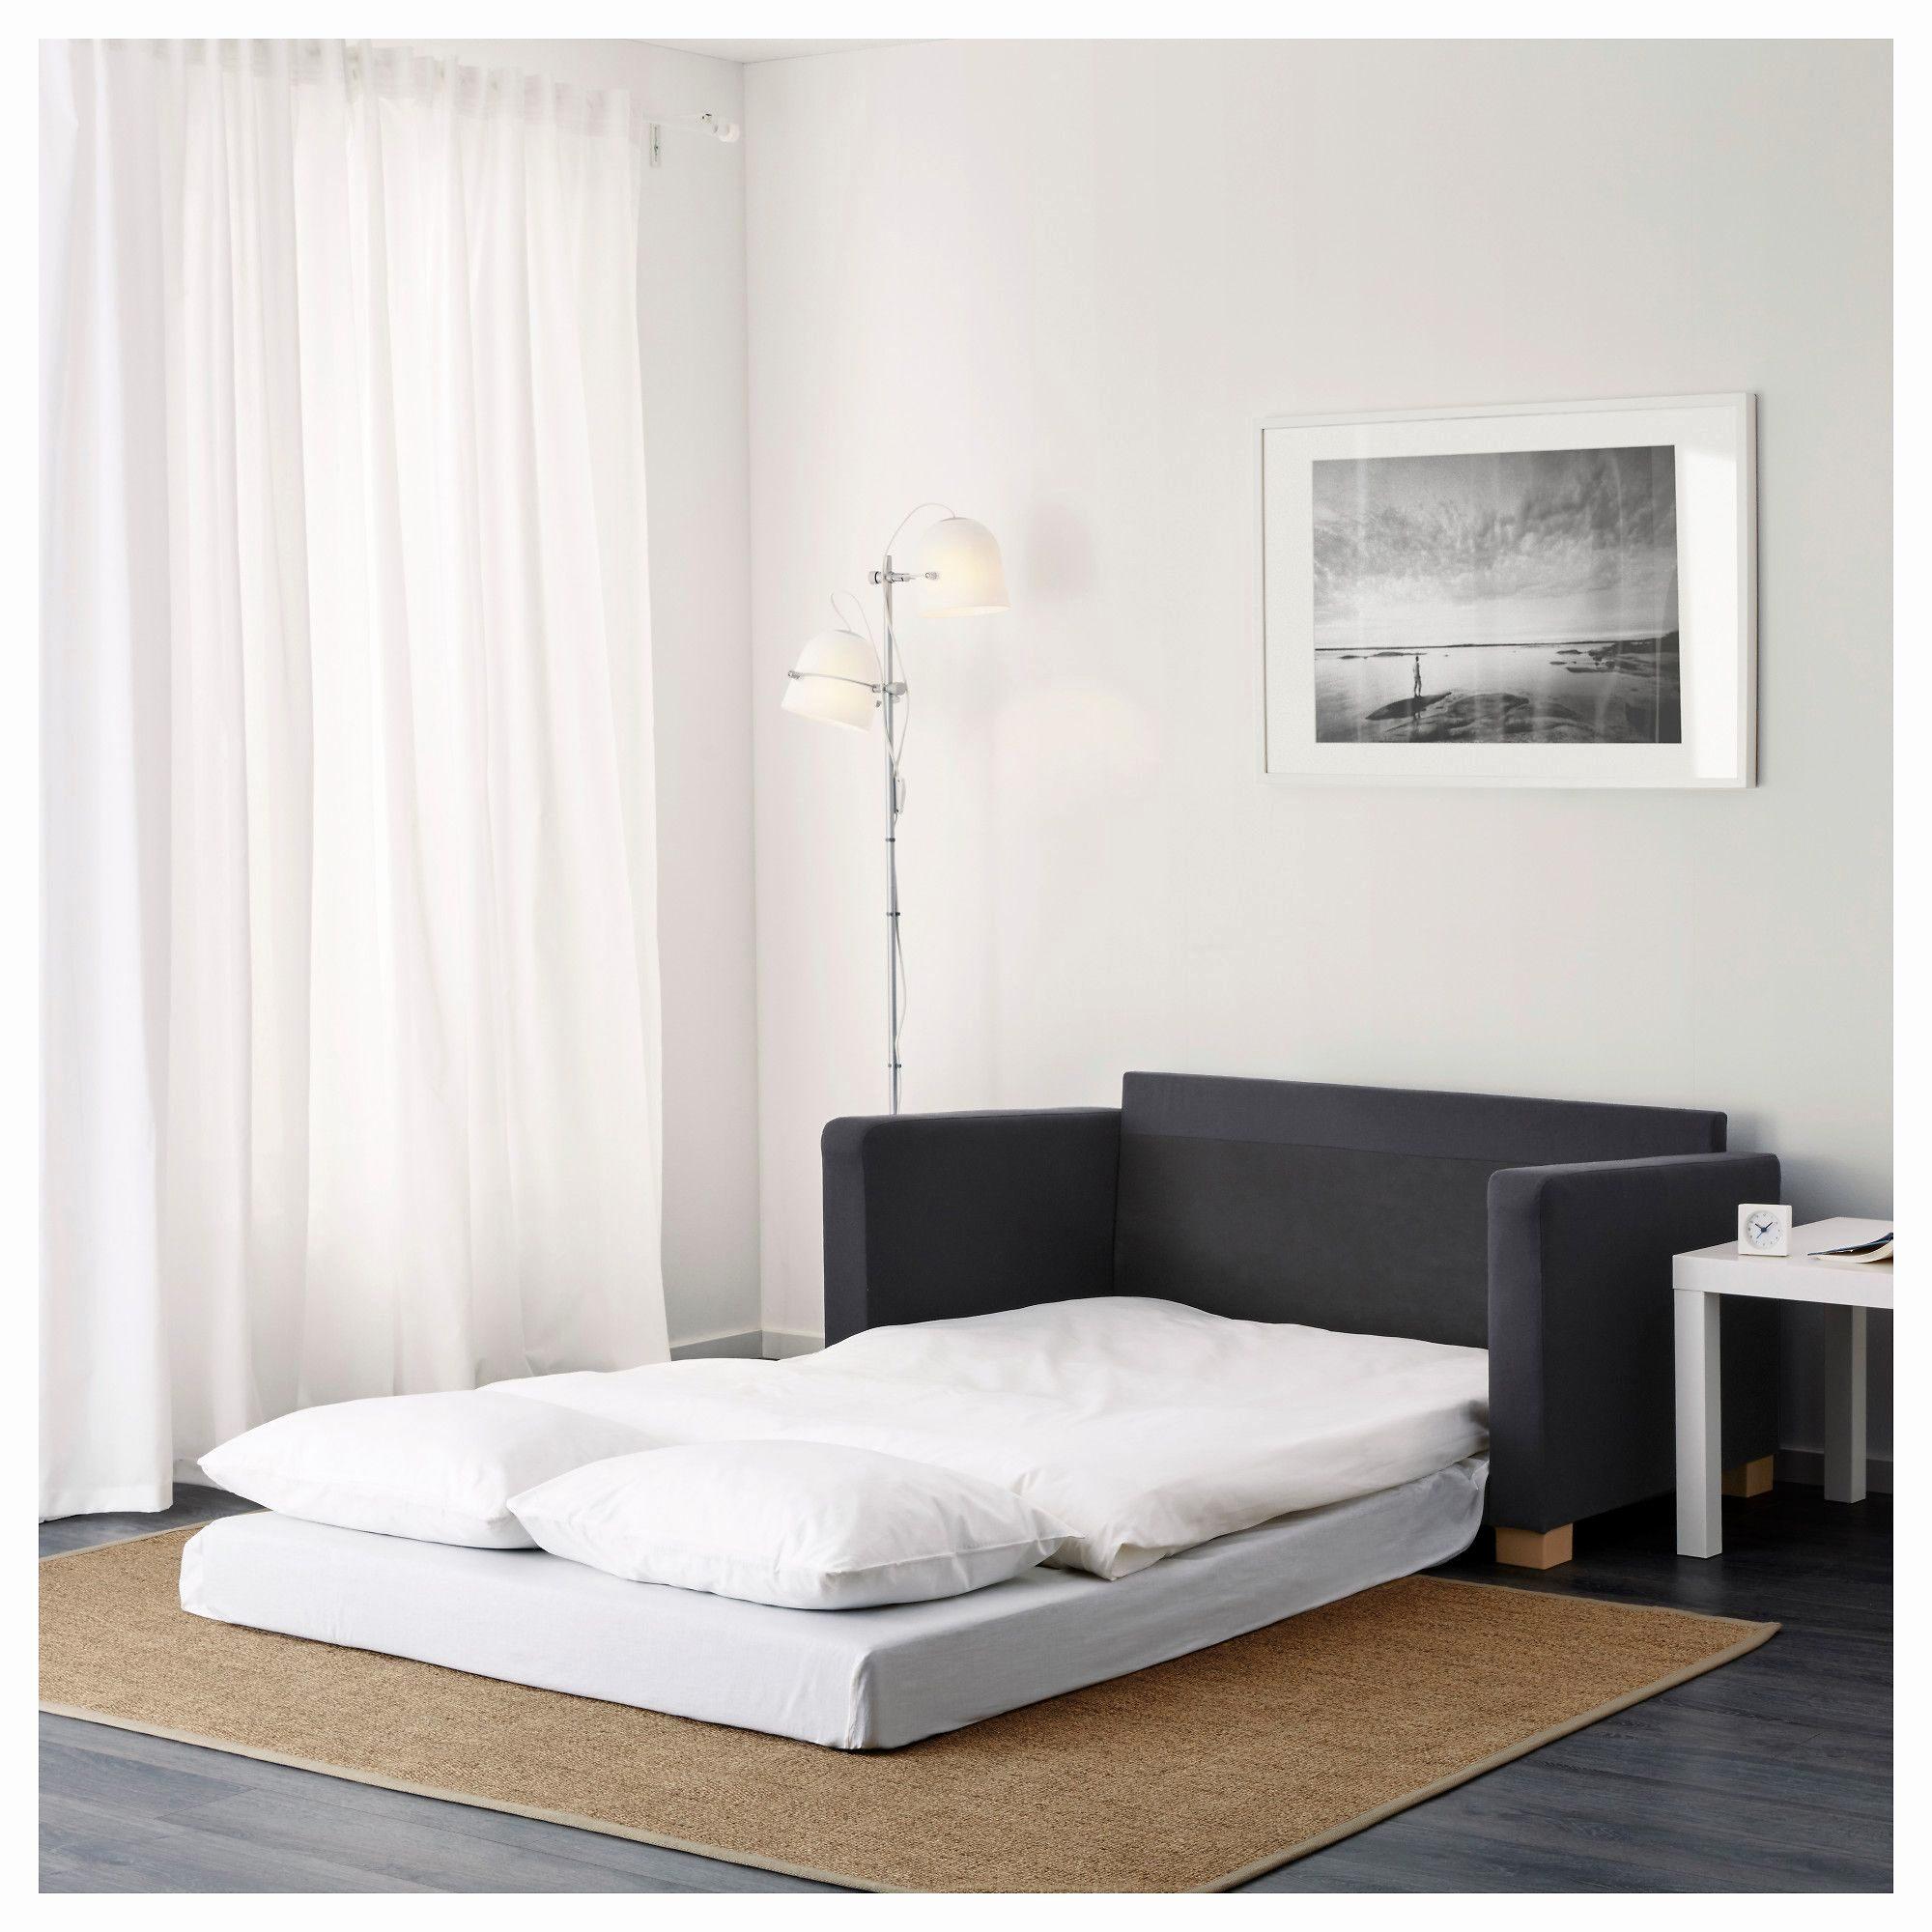 Lit Gigogne 2 Places Ikea Belle Banquette Lit Ikea Inspirant Interior 50 Inspirational Ikea sofa